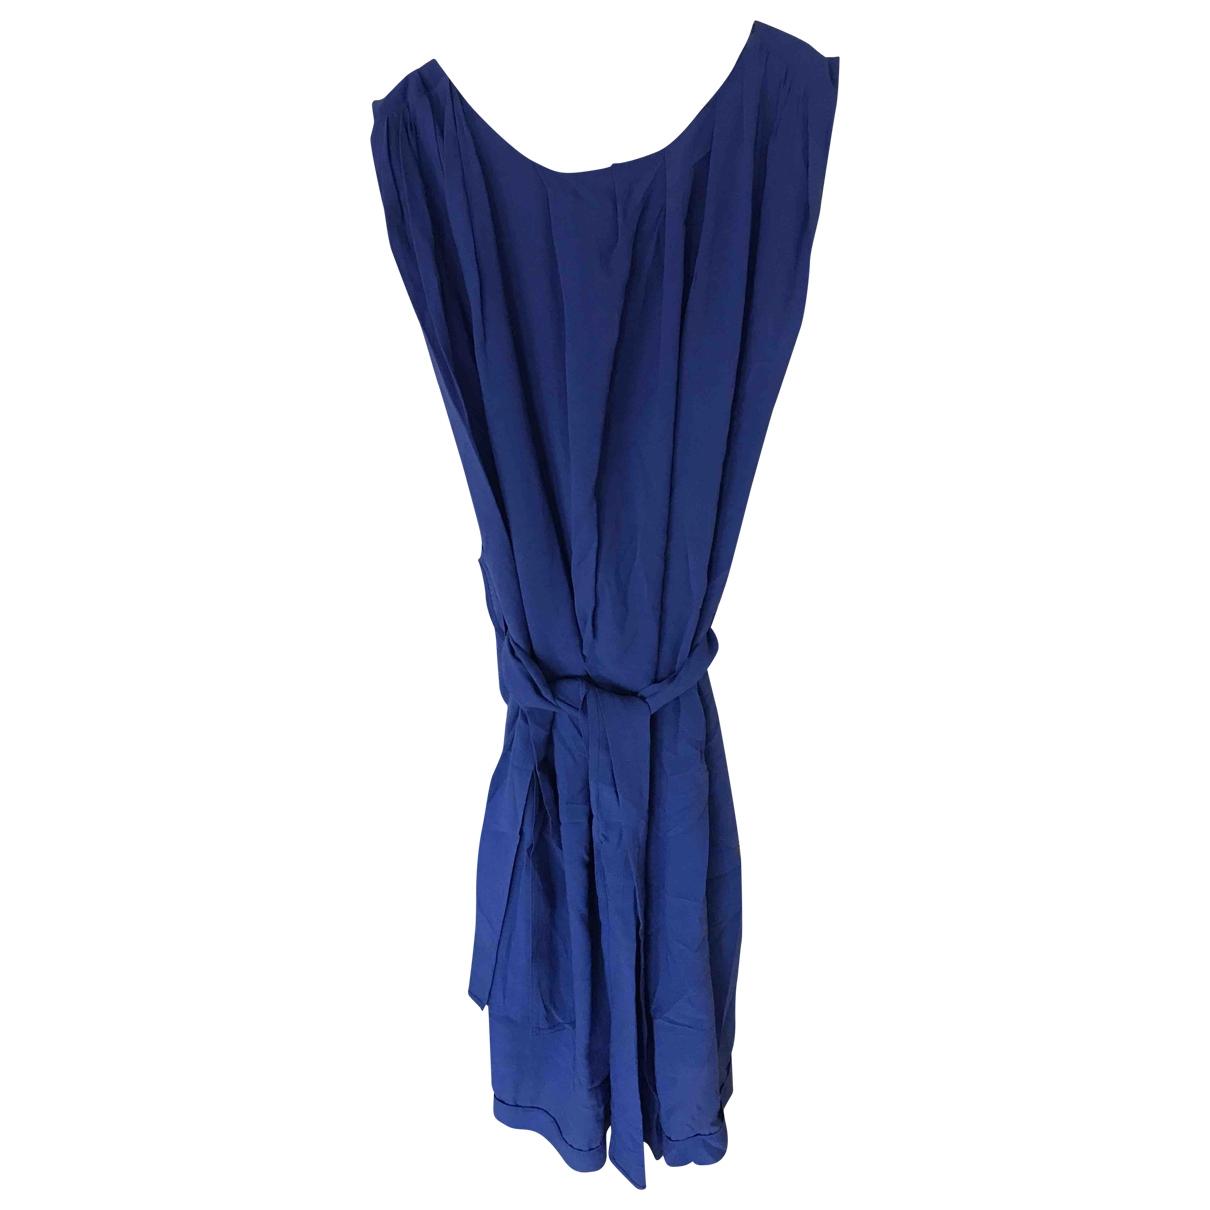 Acne Studios - Robe   pour femme en coton - elasthane - violet